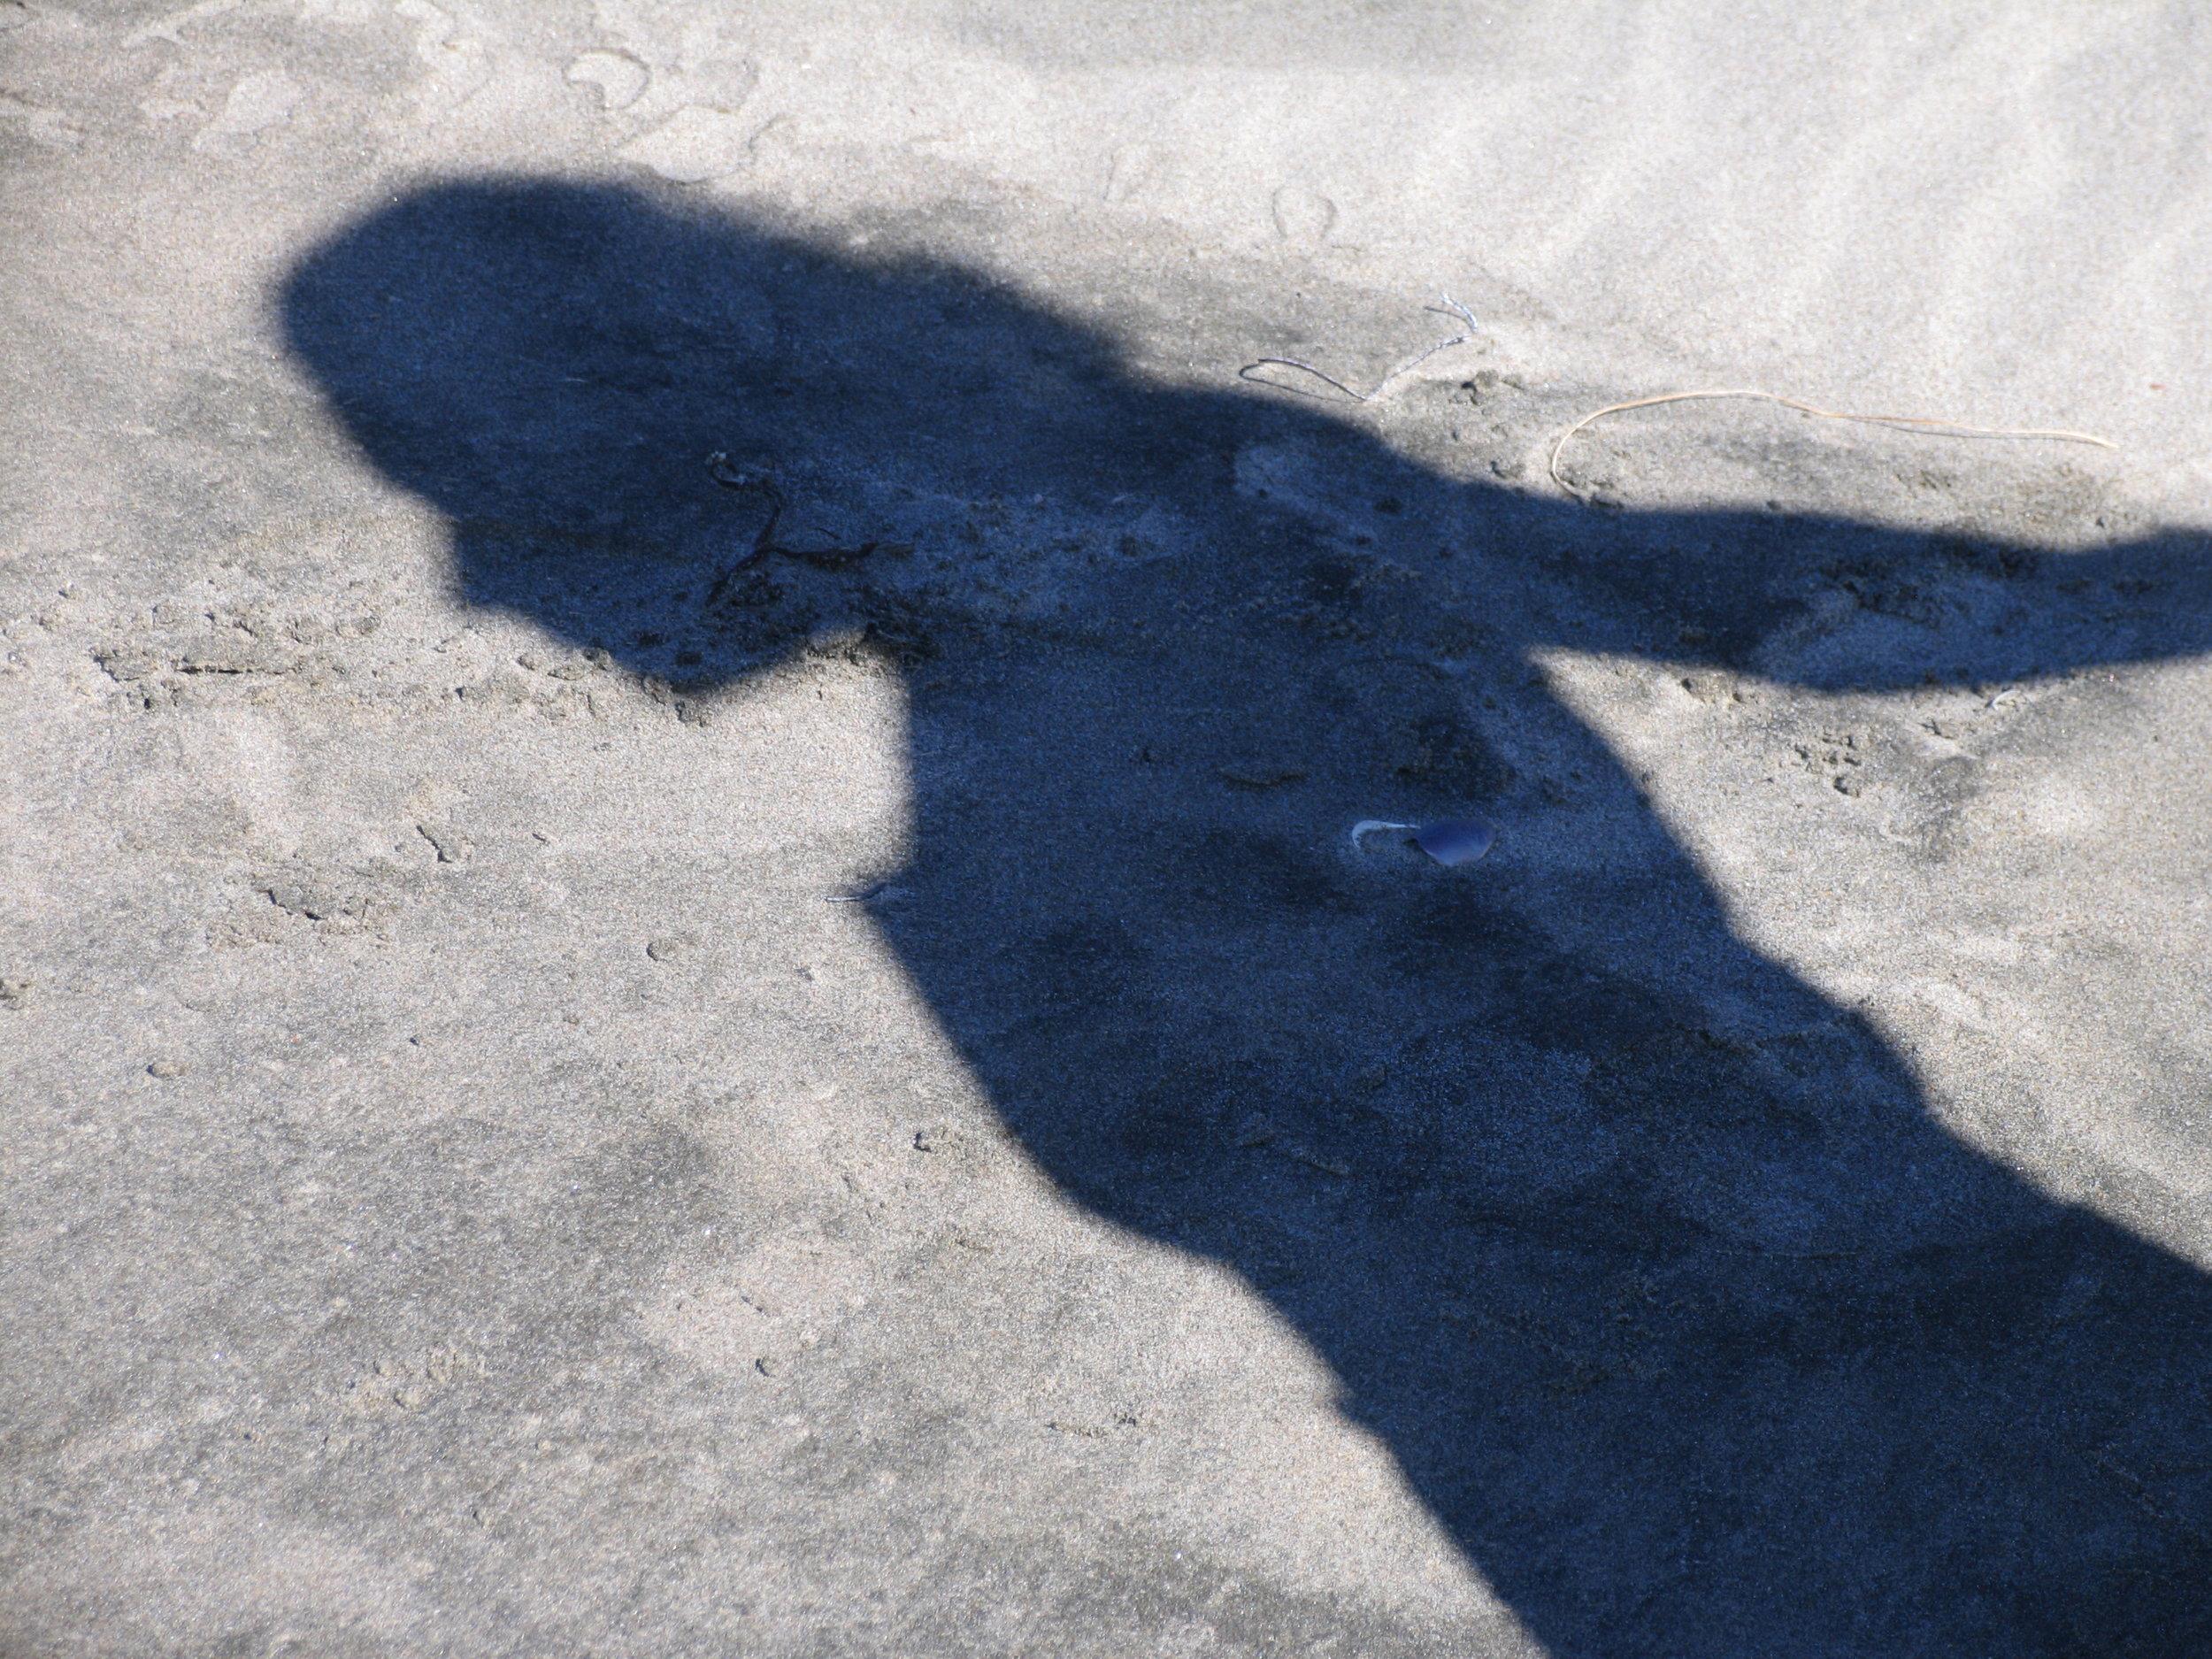 h.c.love shadow of my former self